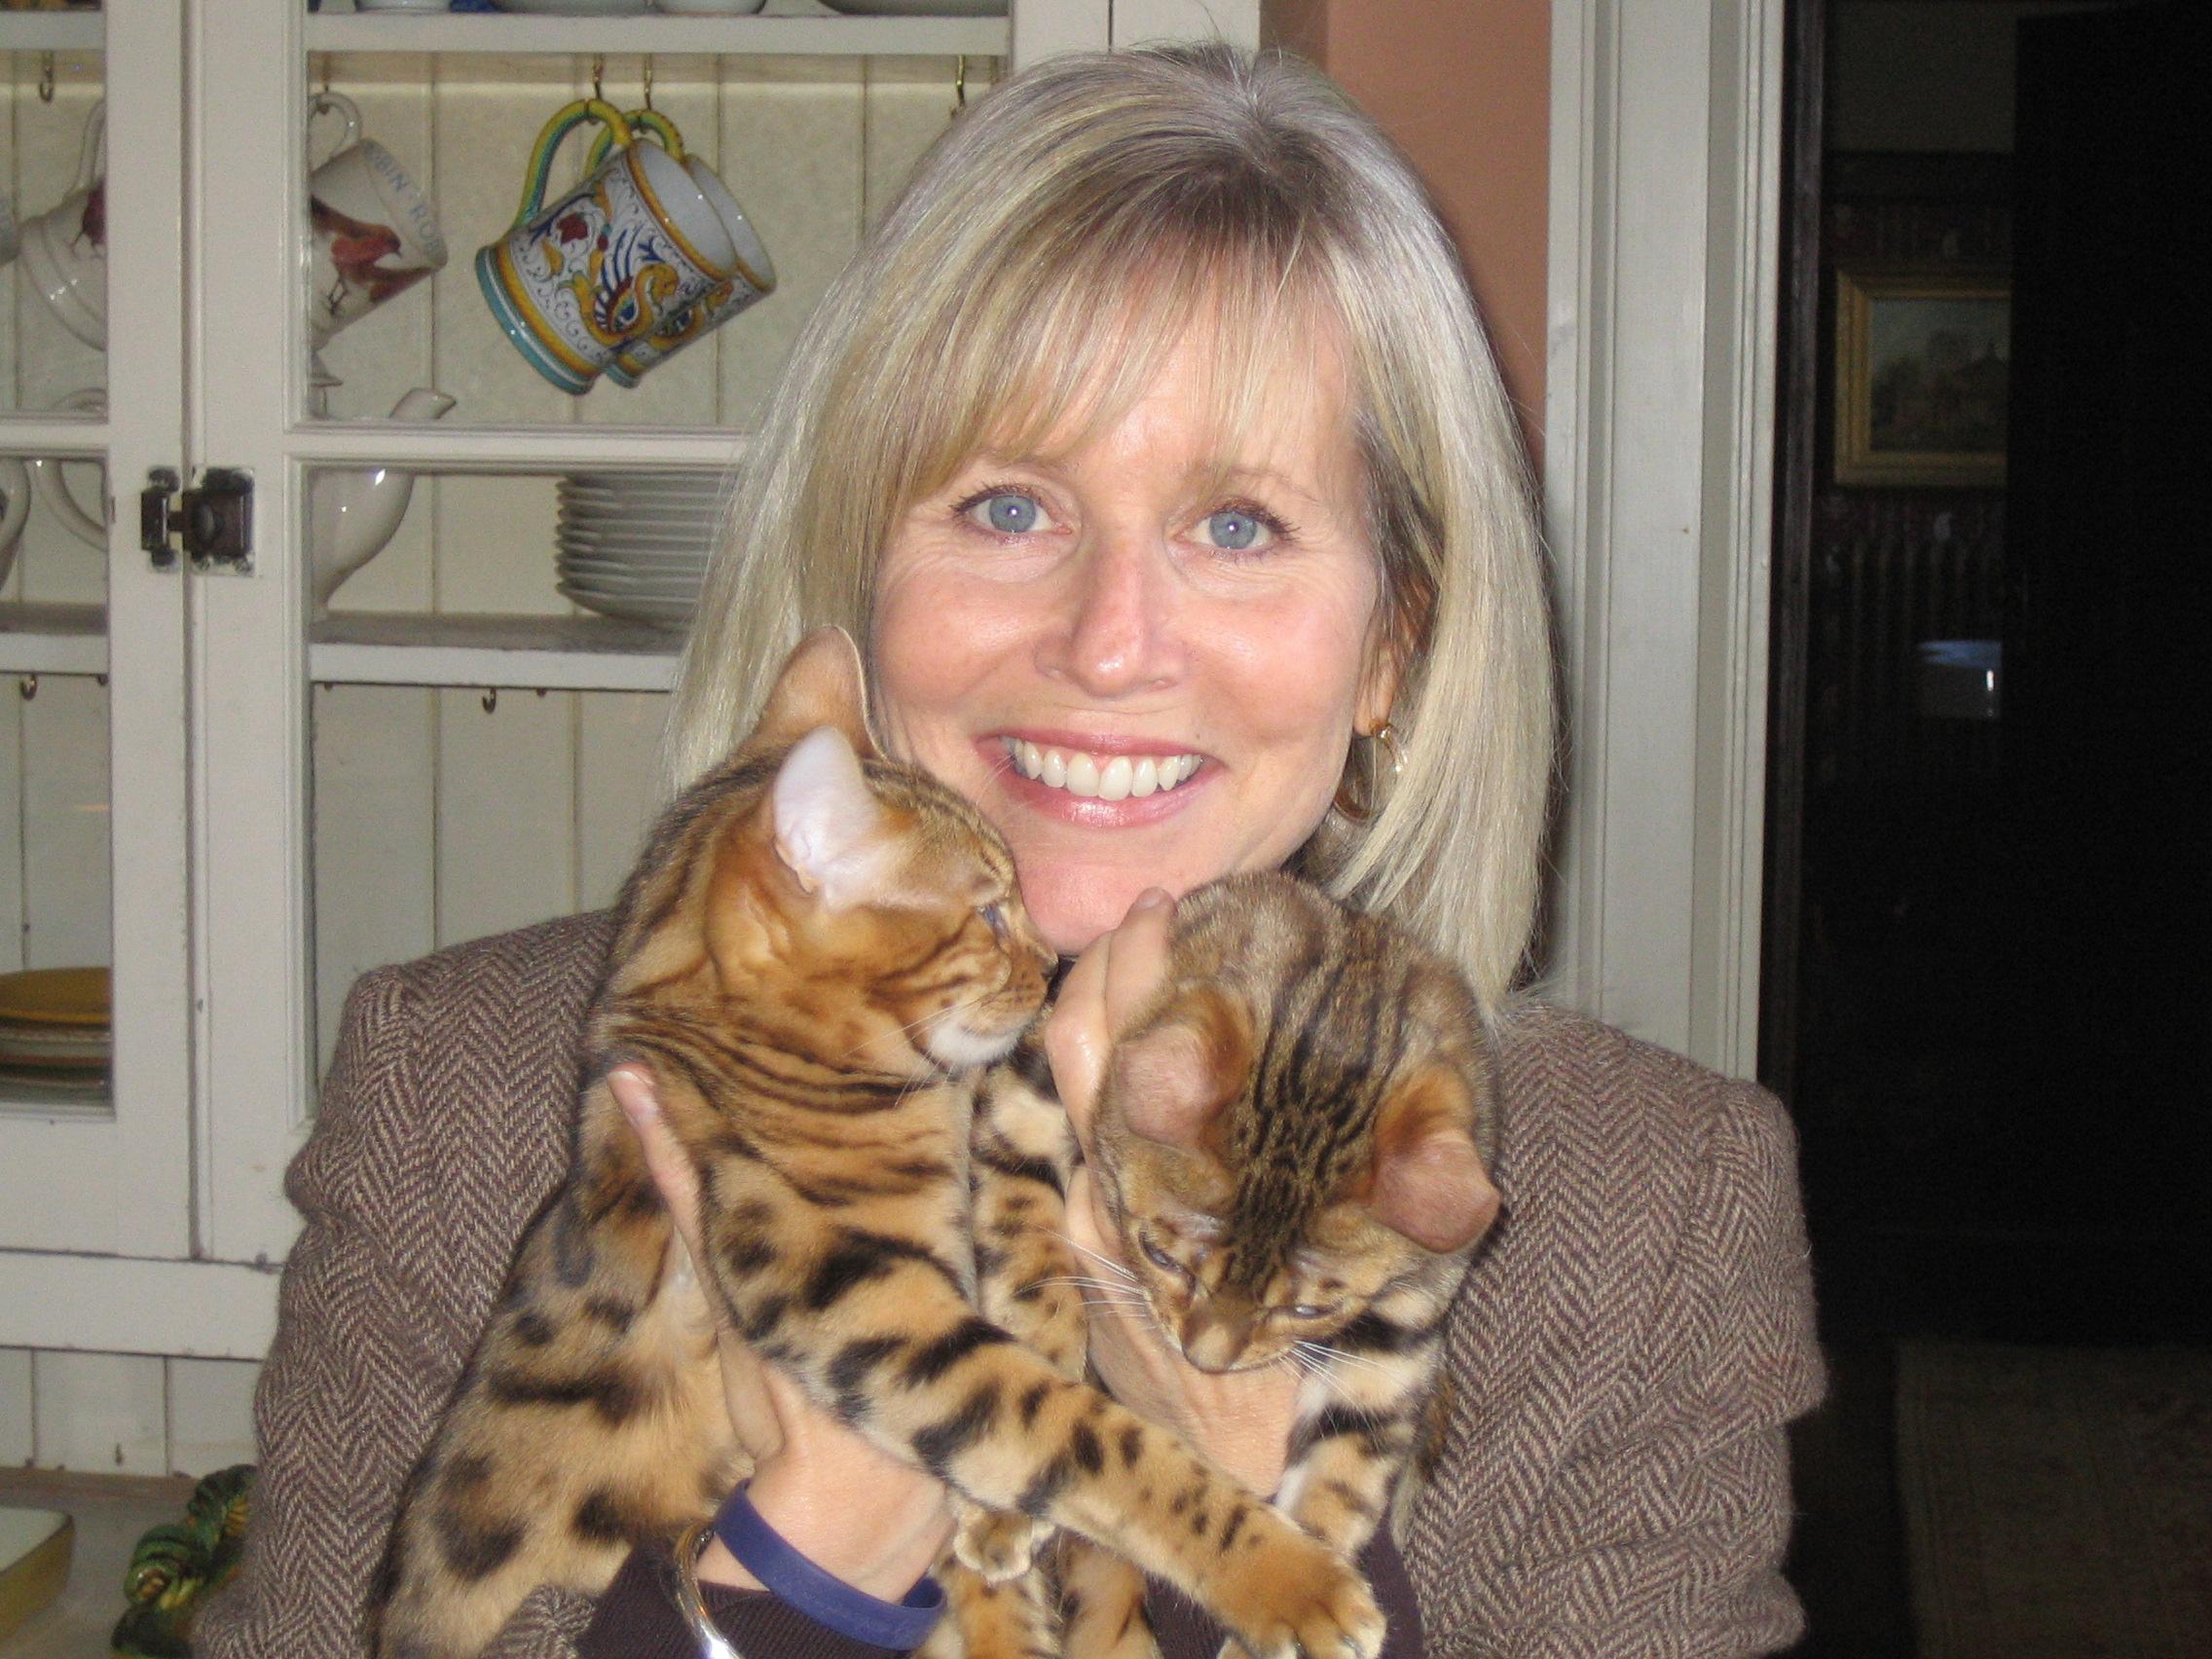 grandma and kittens1.JPG